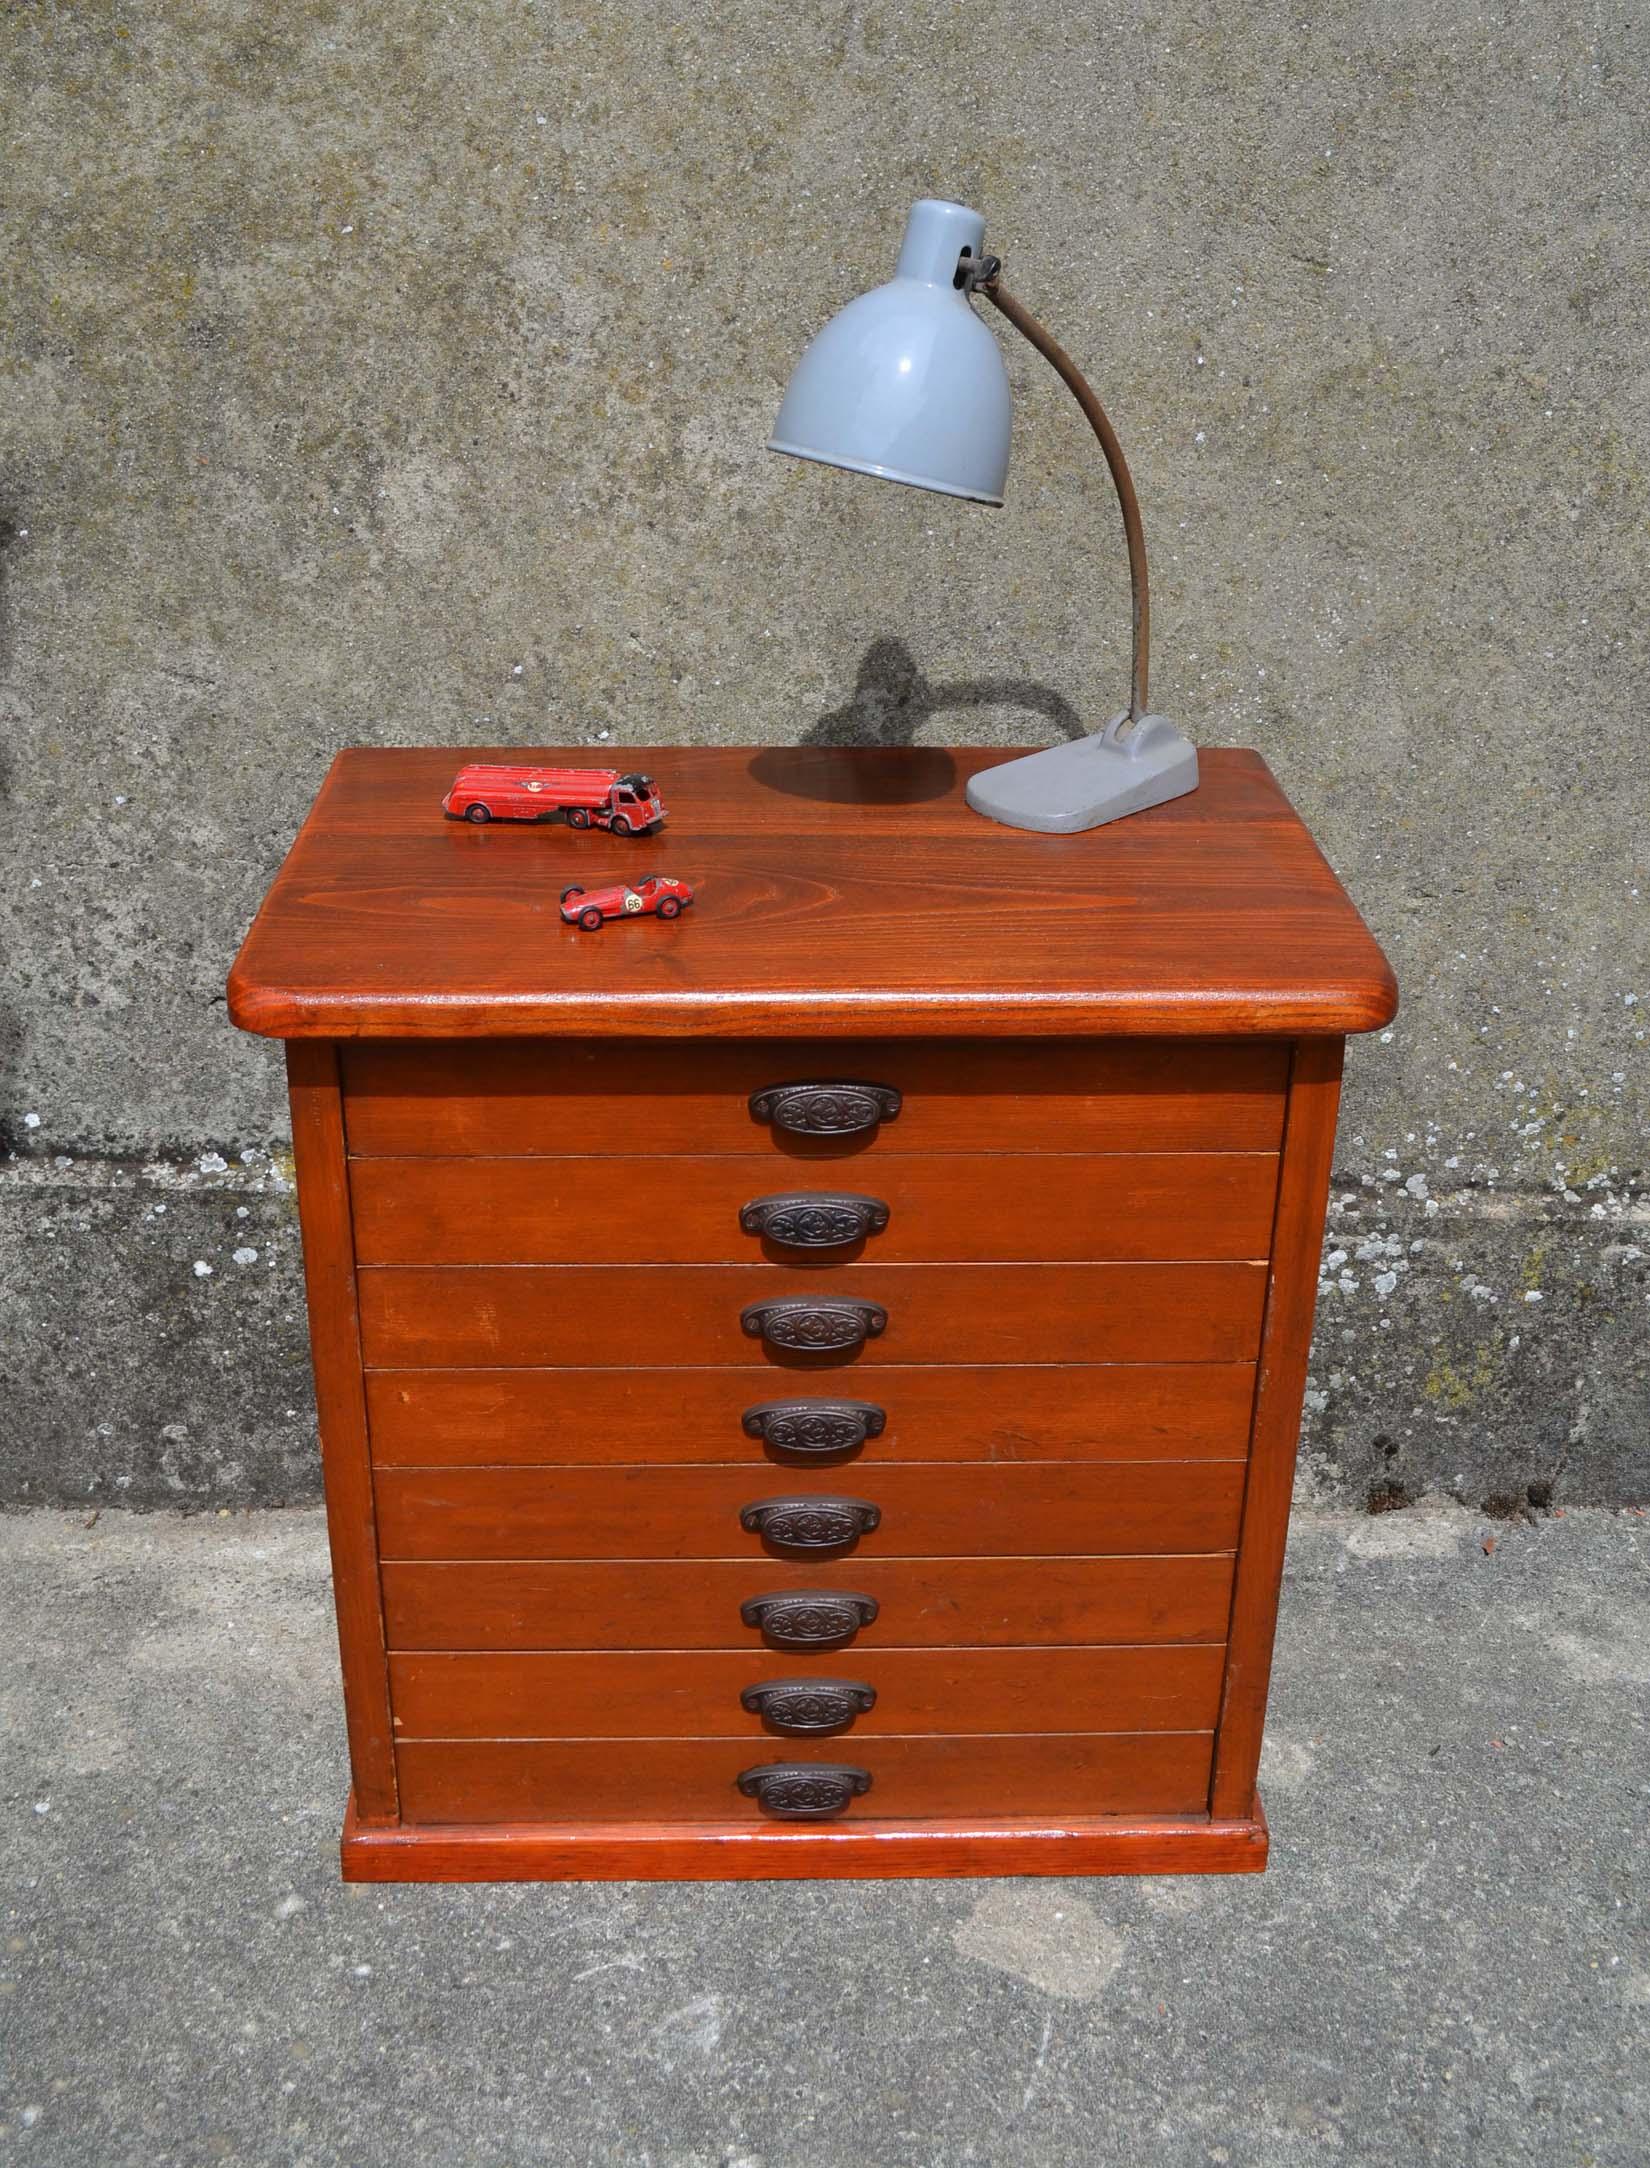 Mobilier industriel ancien chaises meubles tiroirs for Ancien meuble a tiroir